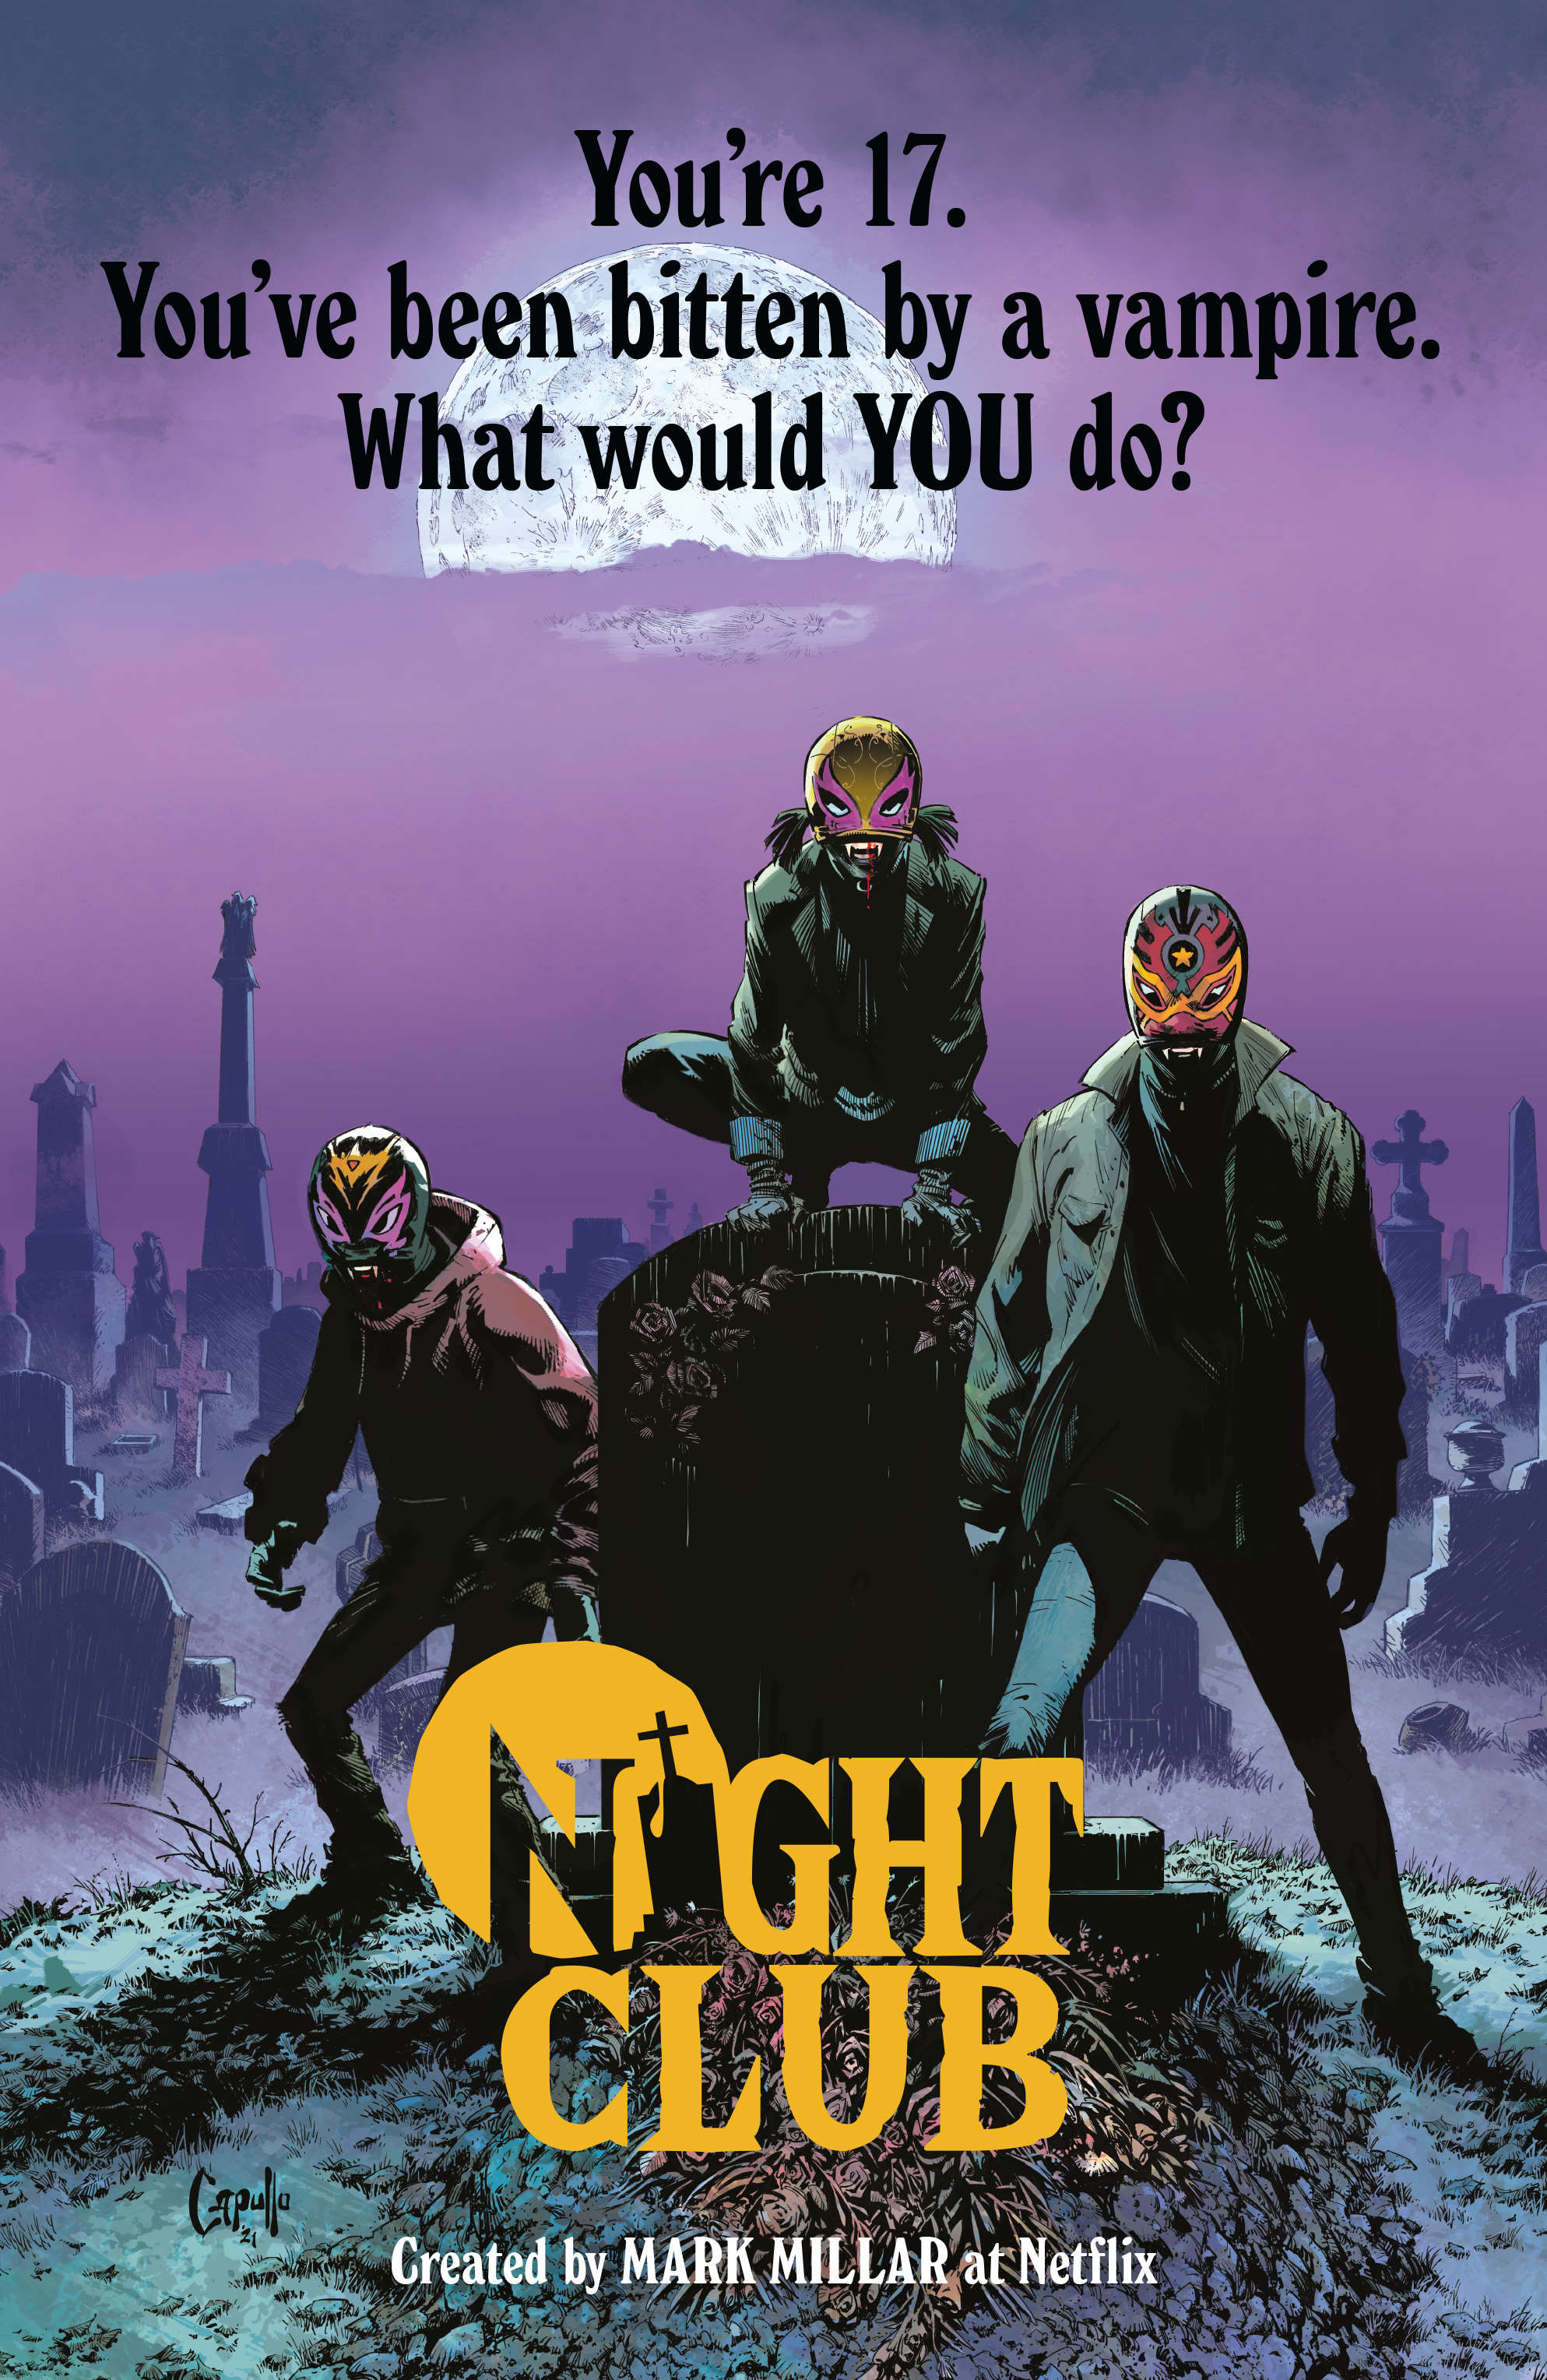 Series Reveal: Meet the teen vampire superheroes of Mark Millar's next Netflix project 'Night Club'